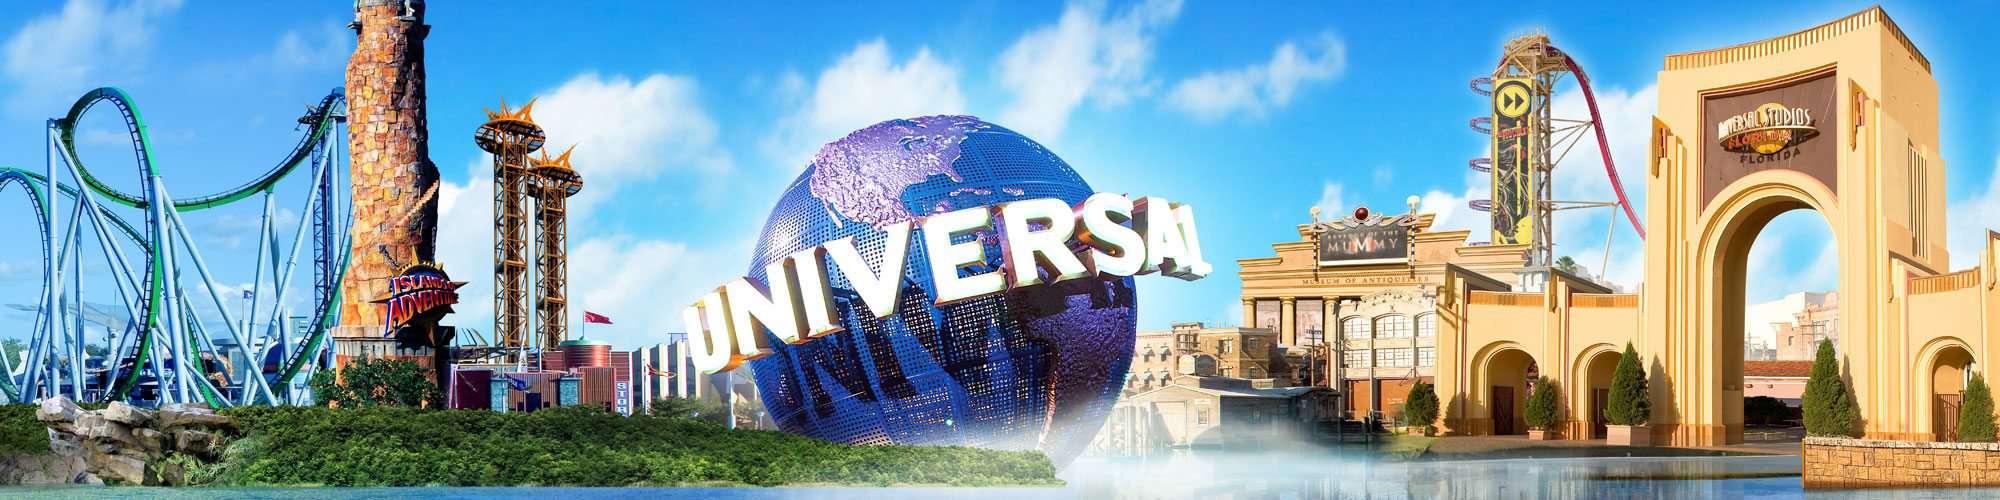 universal-studios-islands-of-adventure-vip-tour